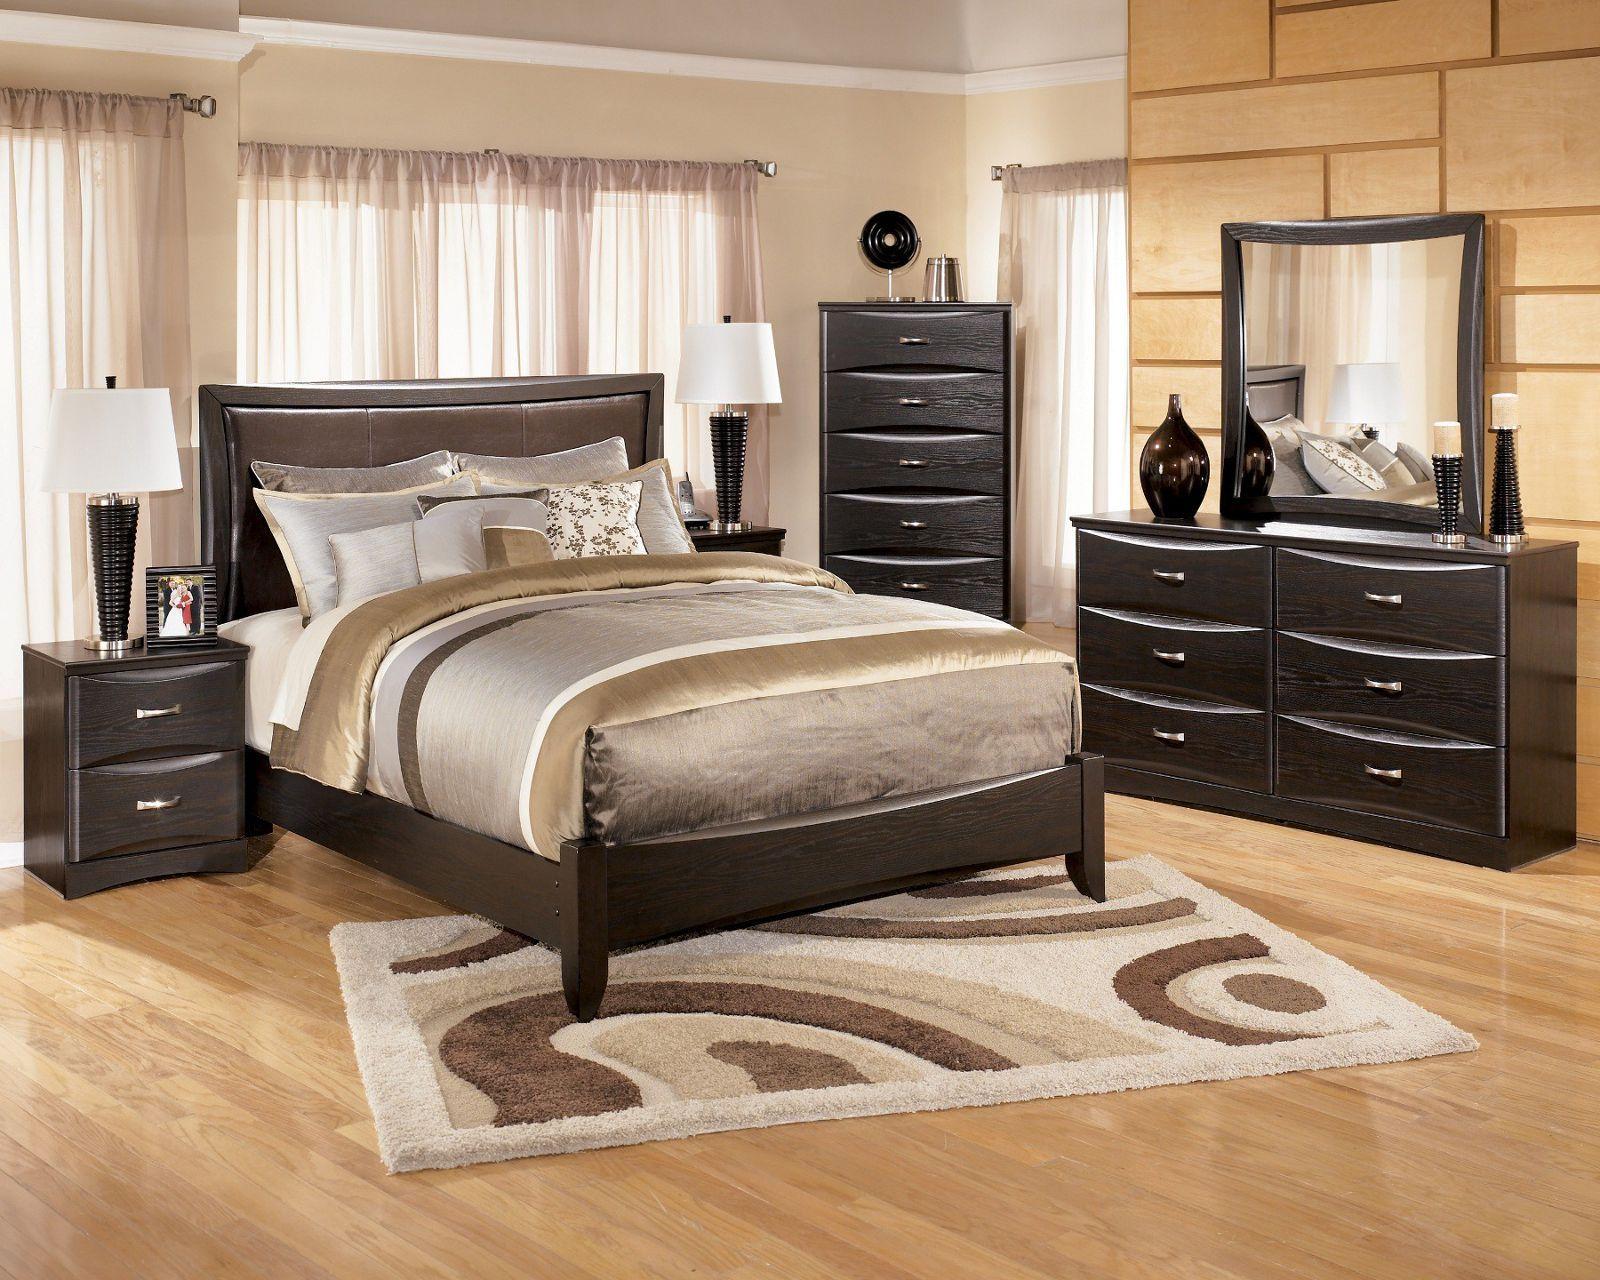 ashley furniture ashley furniture maribel panel bedroom set queen